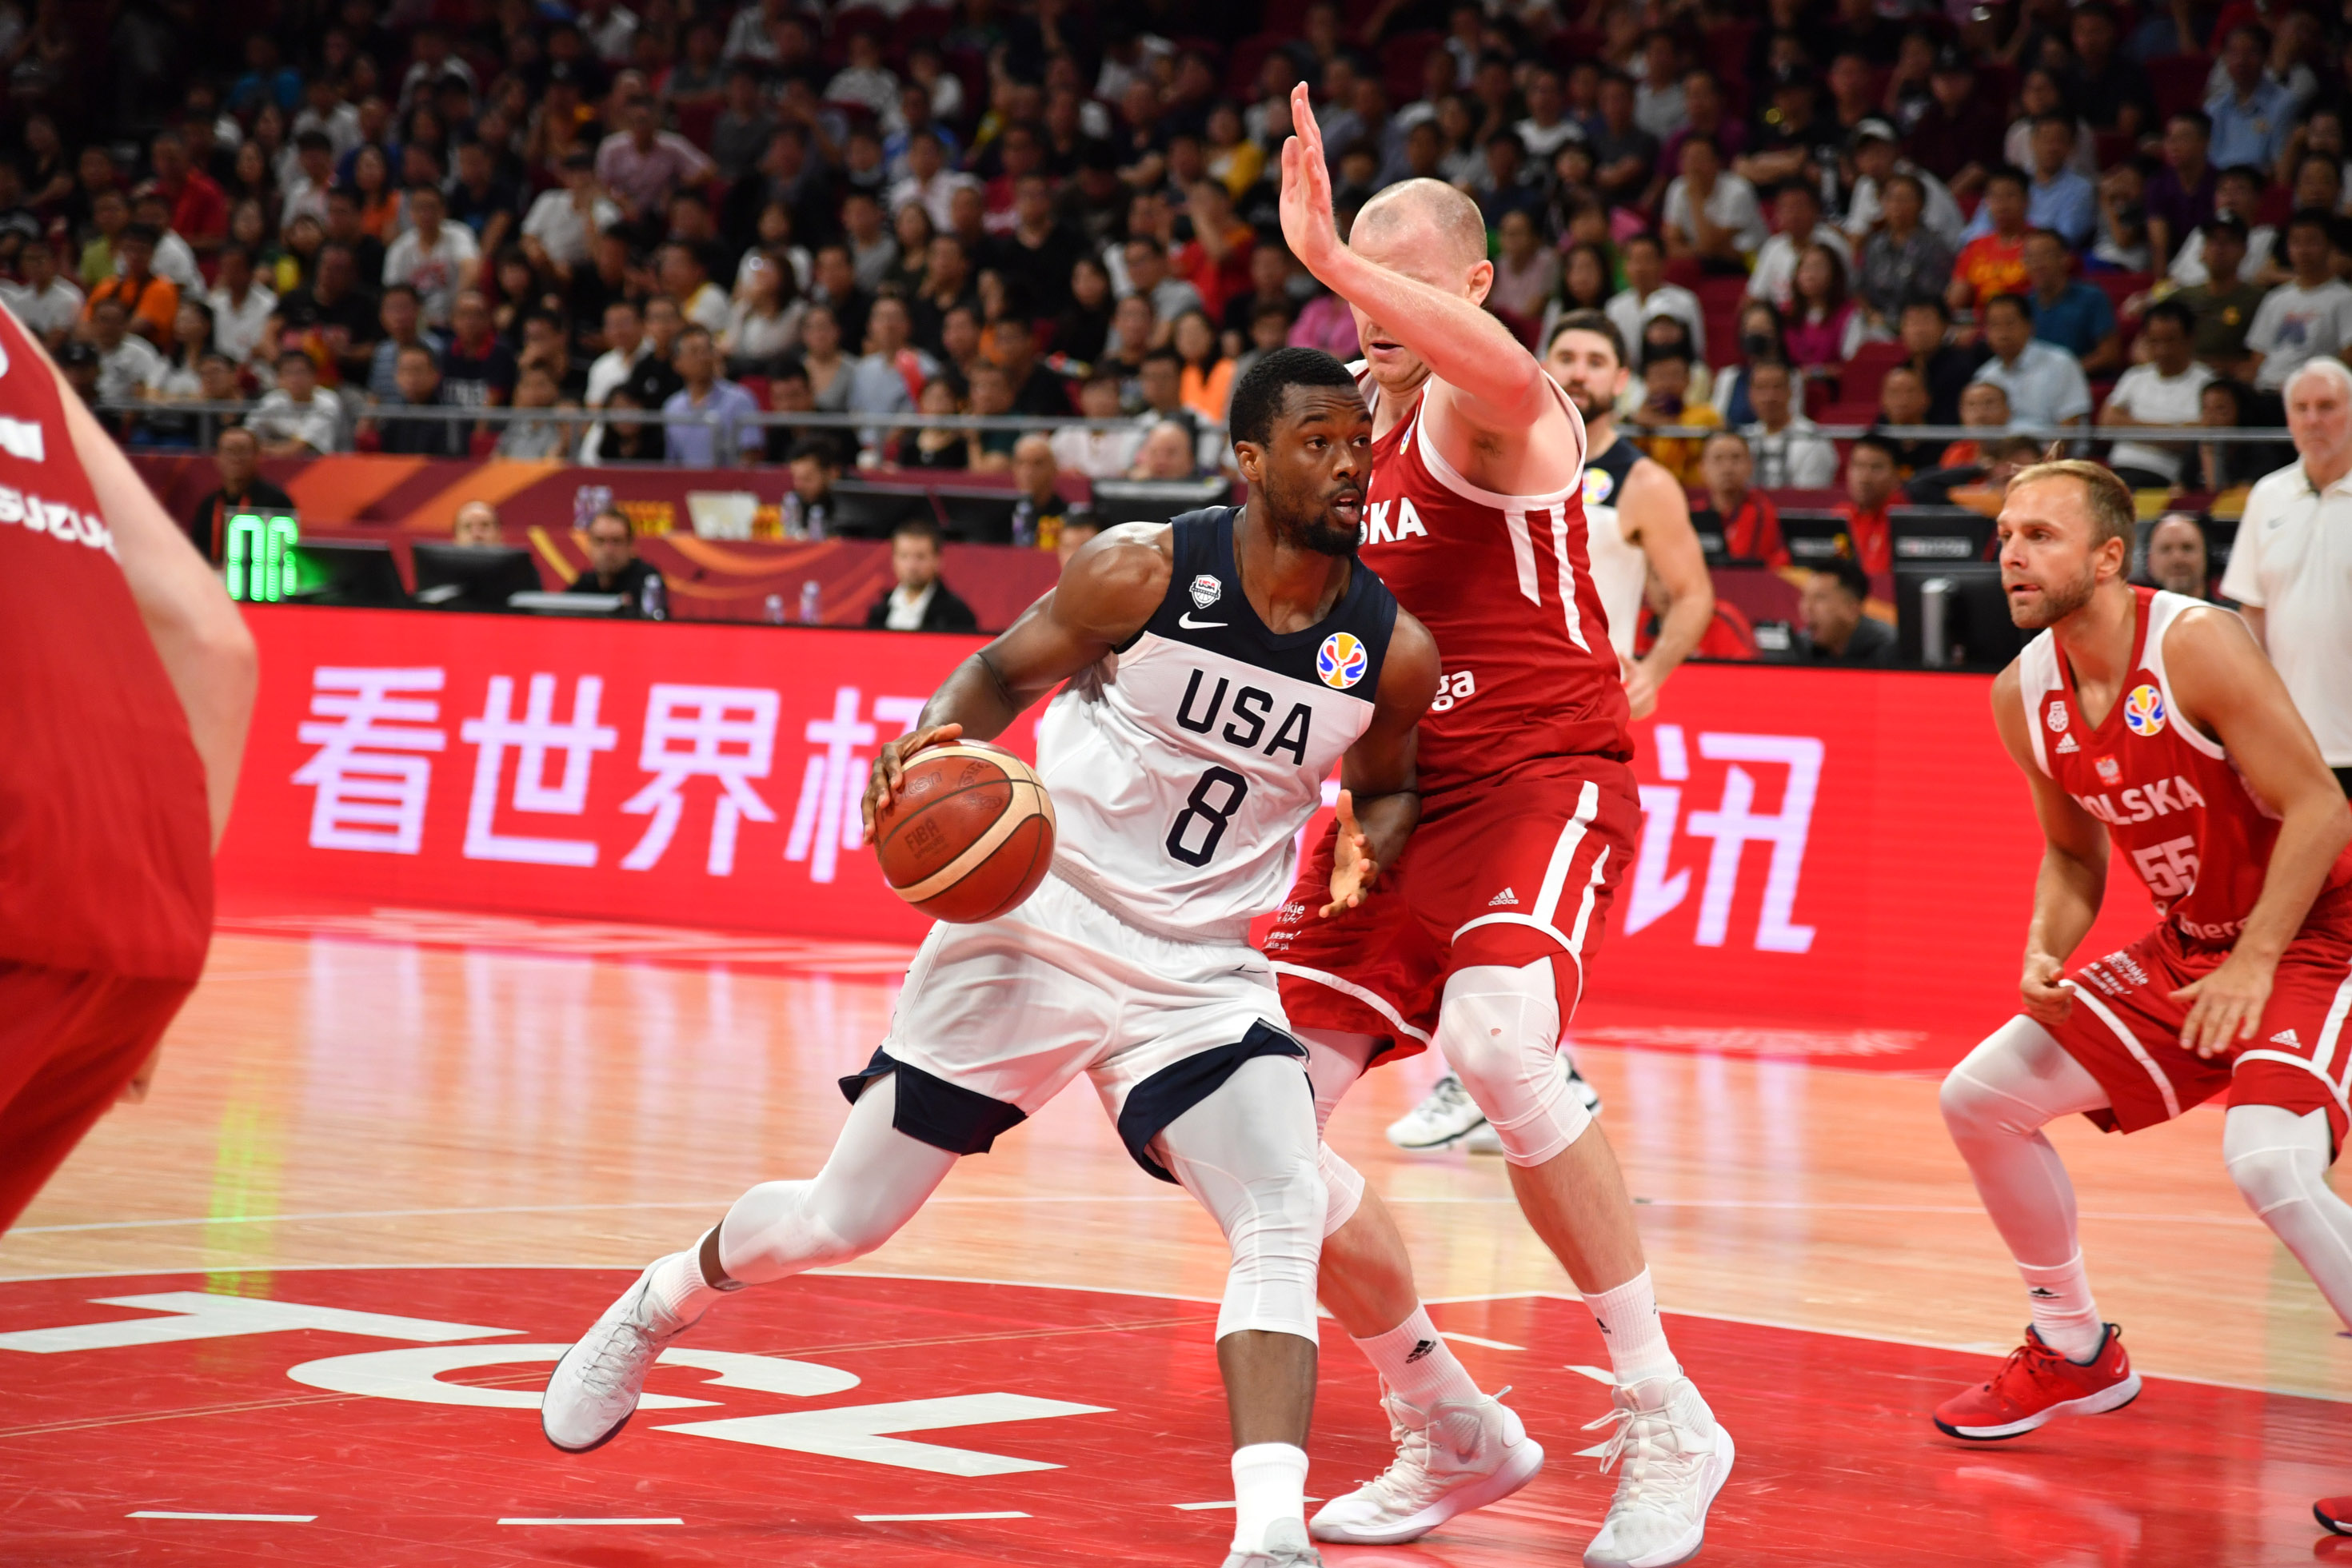 2019 FIBA World Cup: Classification 7-8: USA v Poland